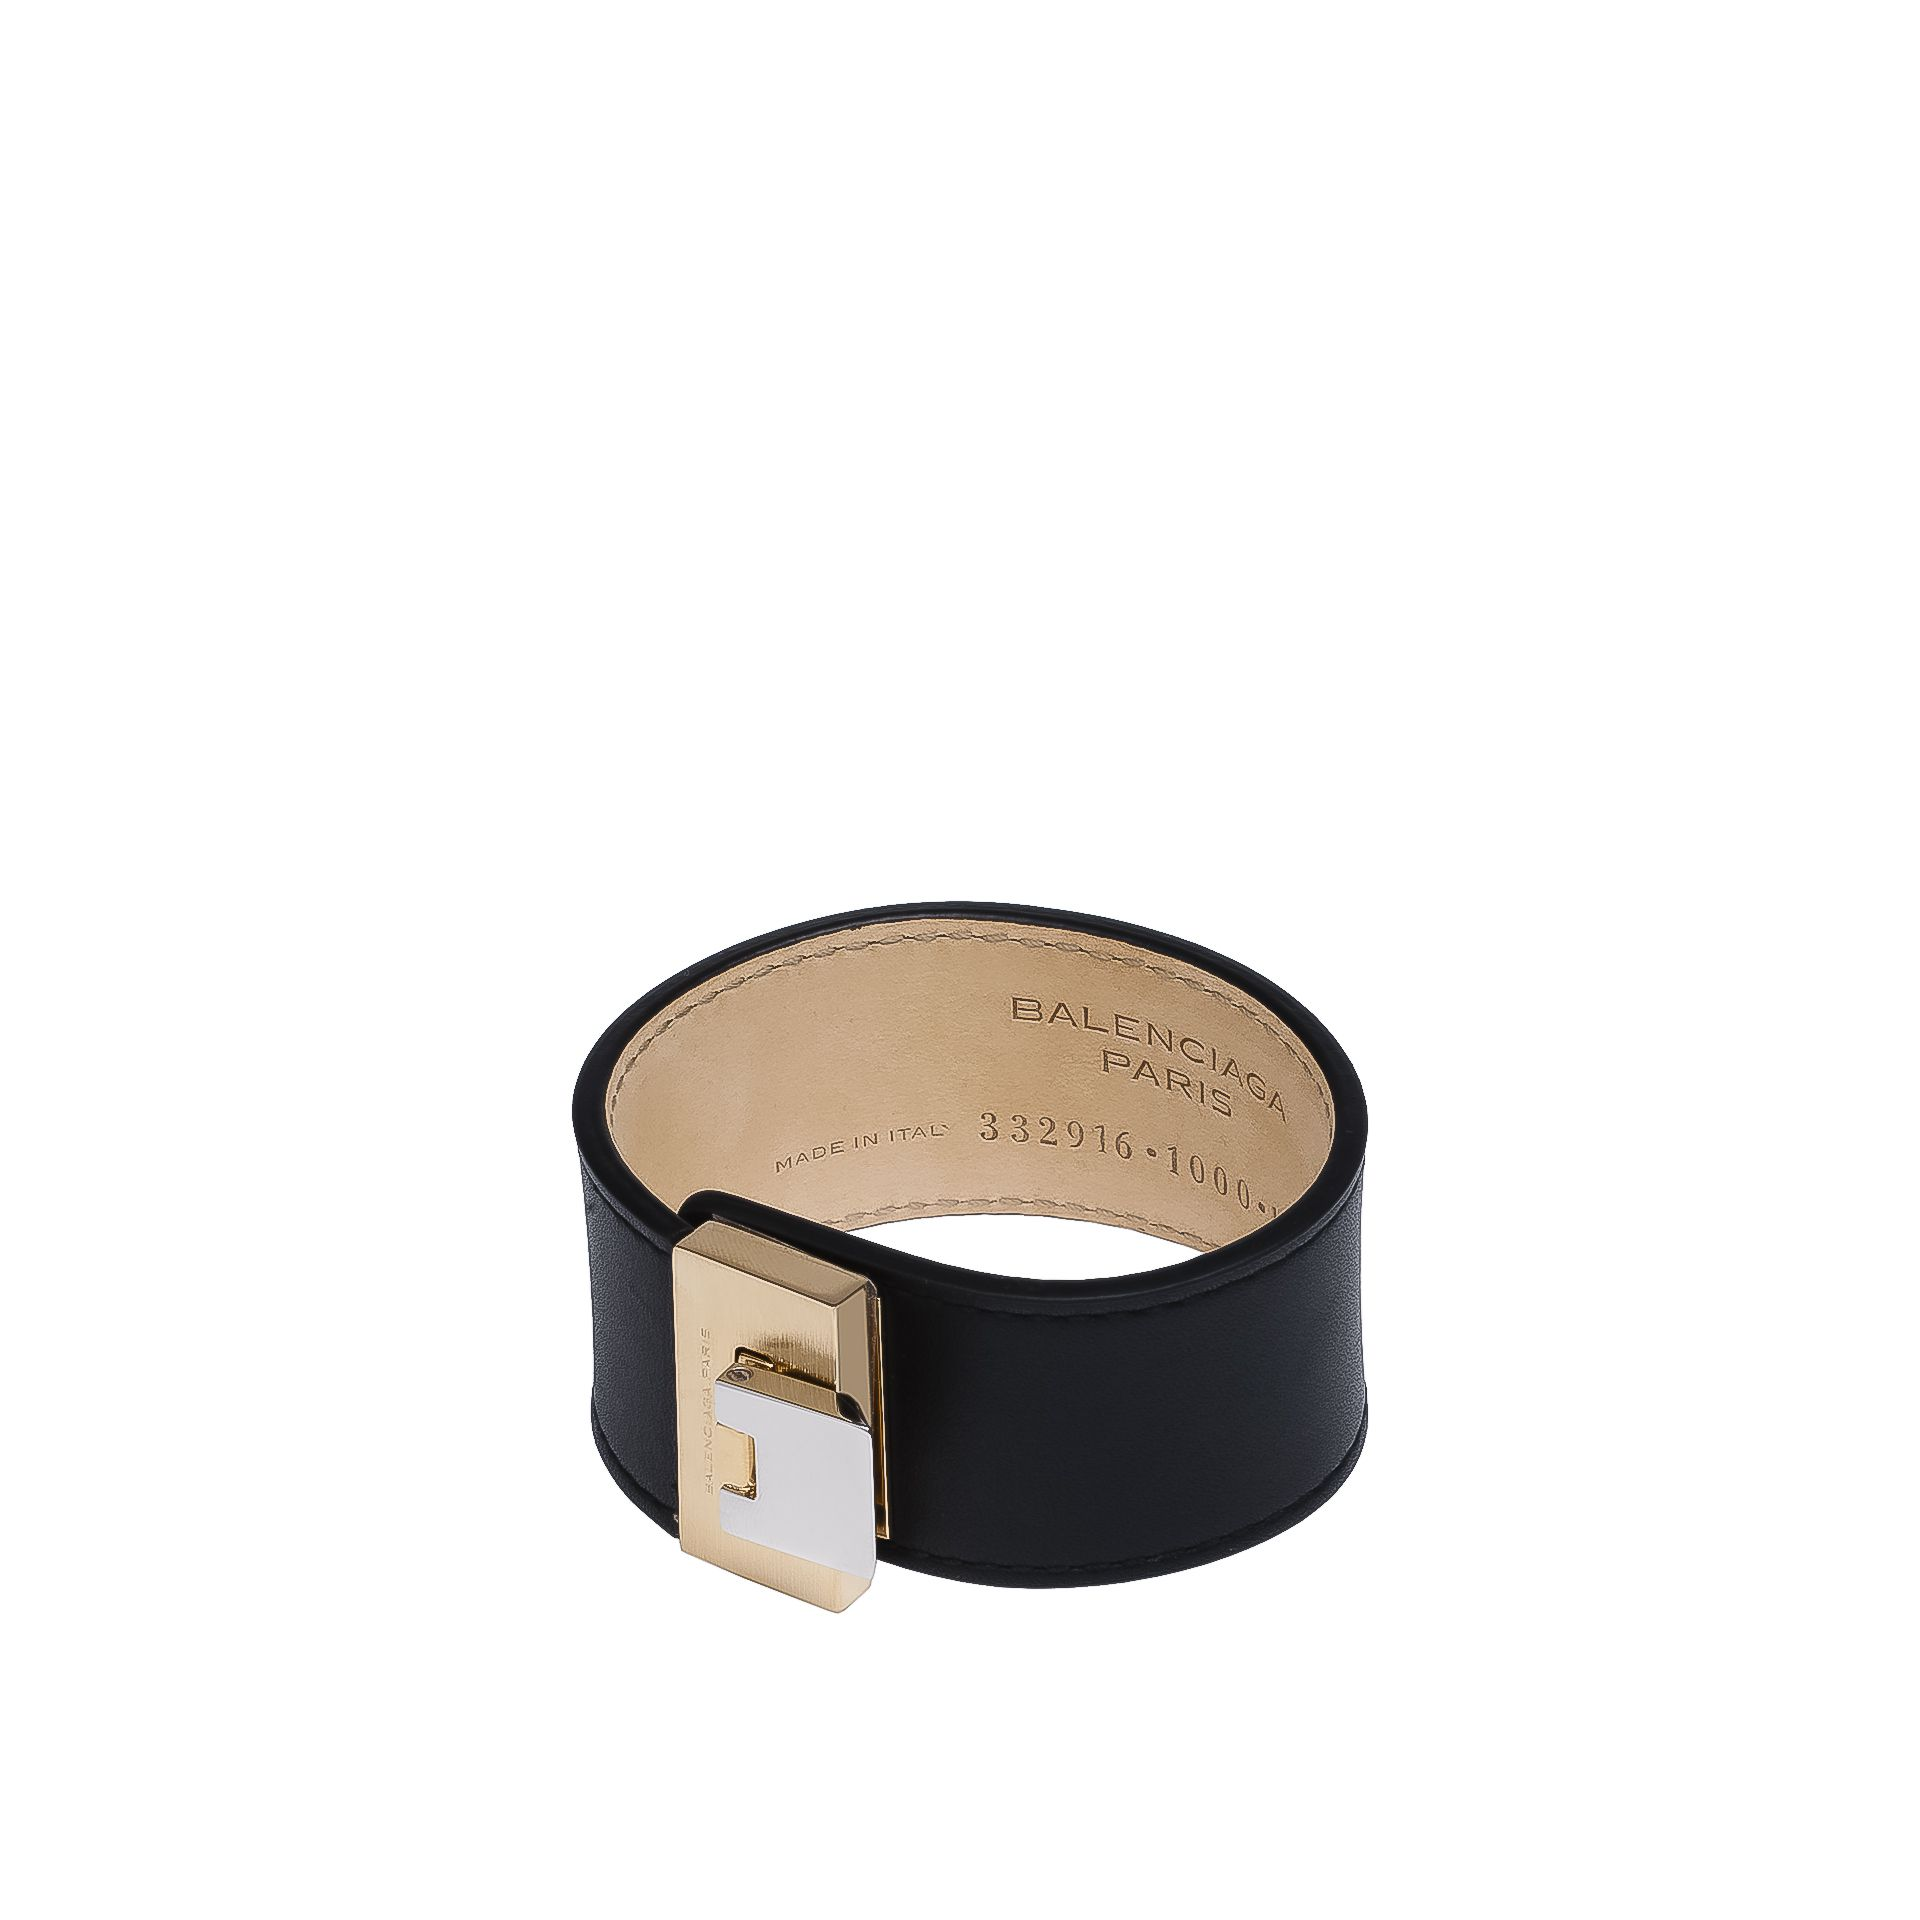 BALENCIAGA Balenciaga Le Dix Bracelet Bracelet D f